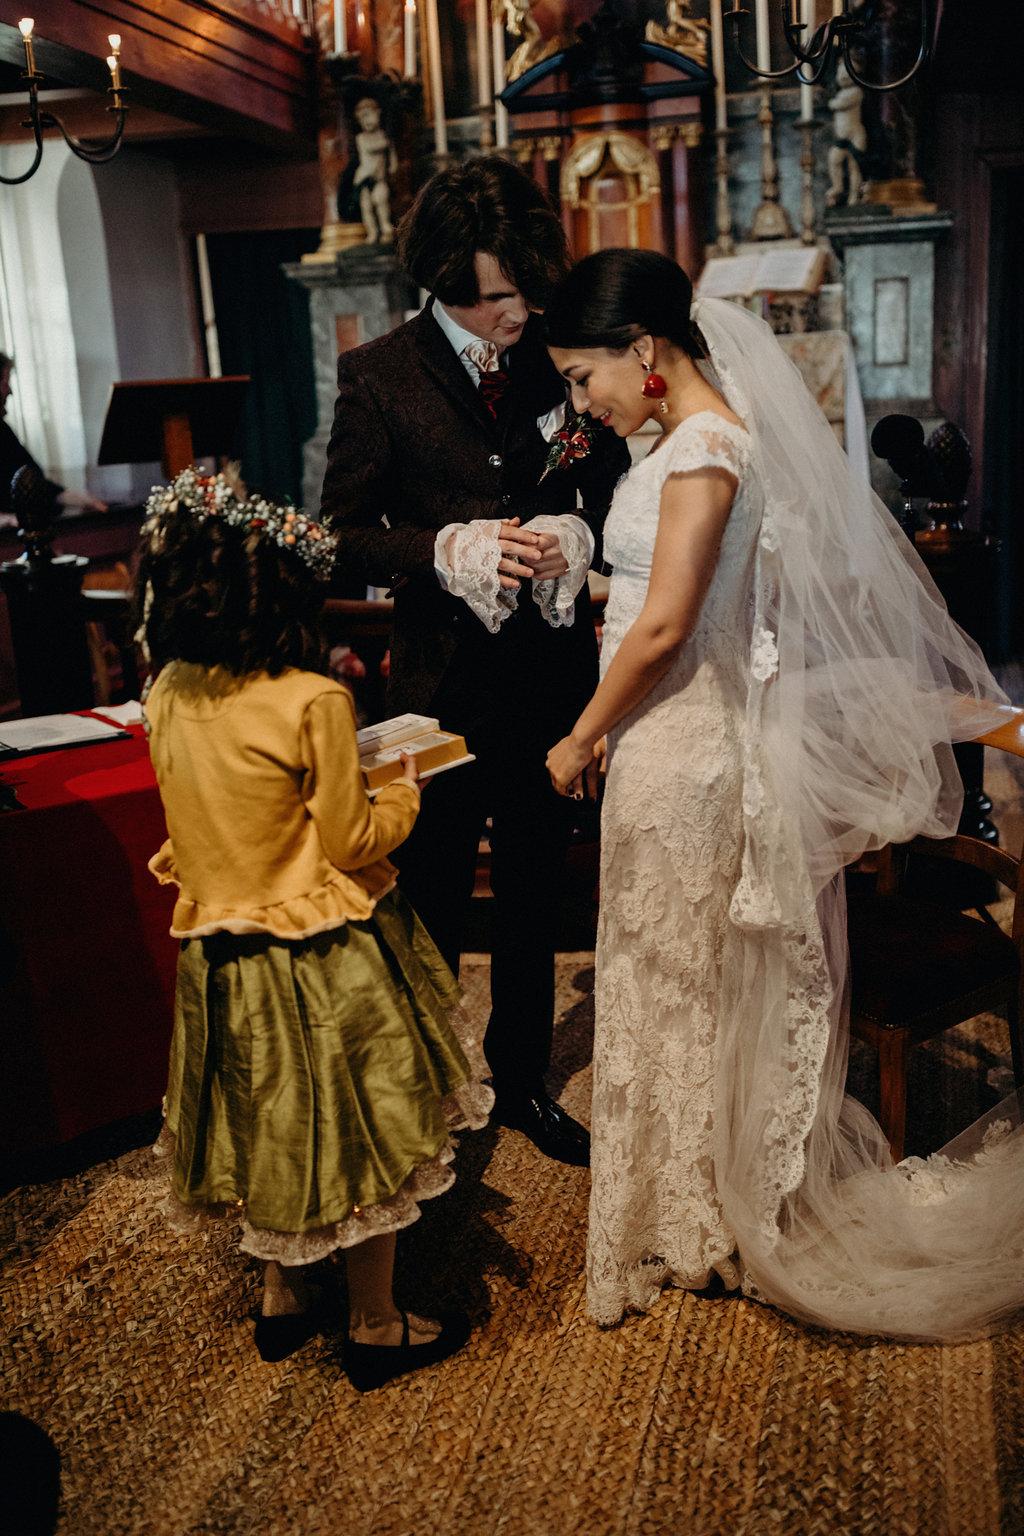 193-sjoerdbooijphotography-wedding-coen-janaina.jpg